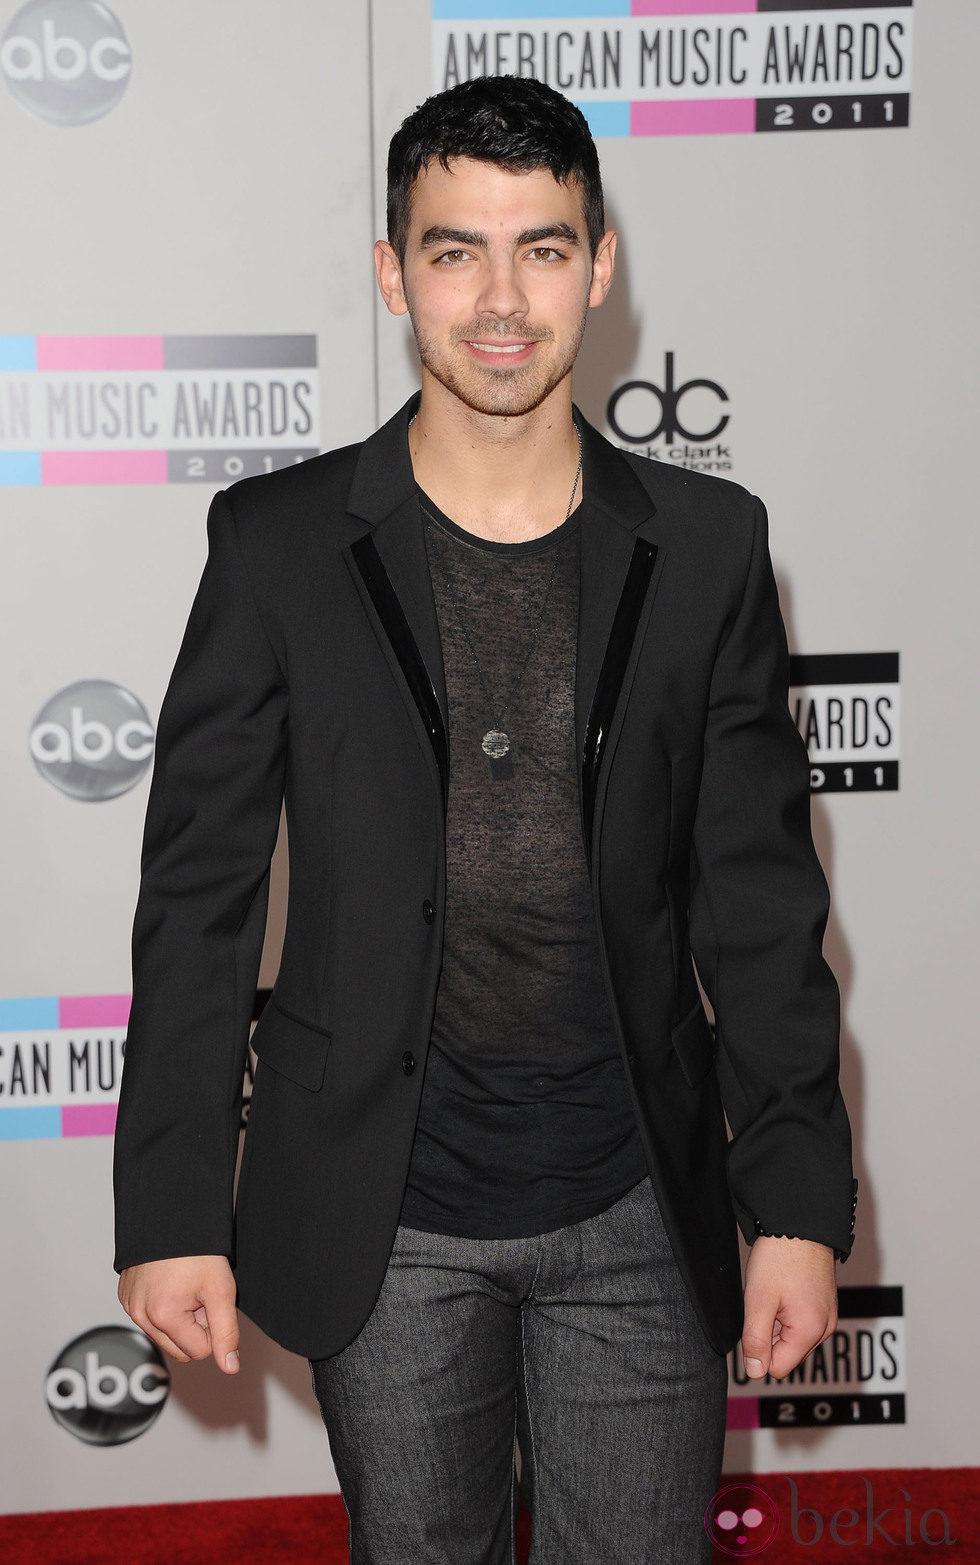 Joe Jonas en los American Music Awards 2011